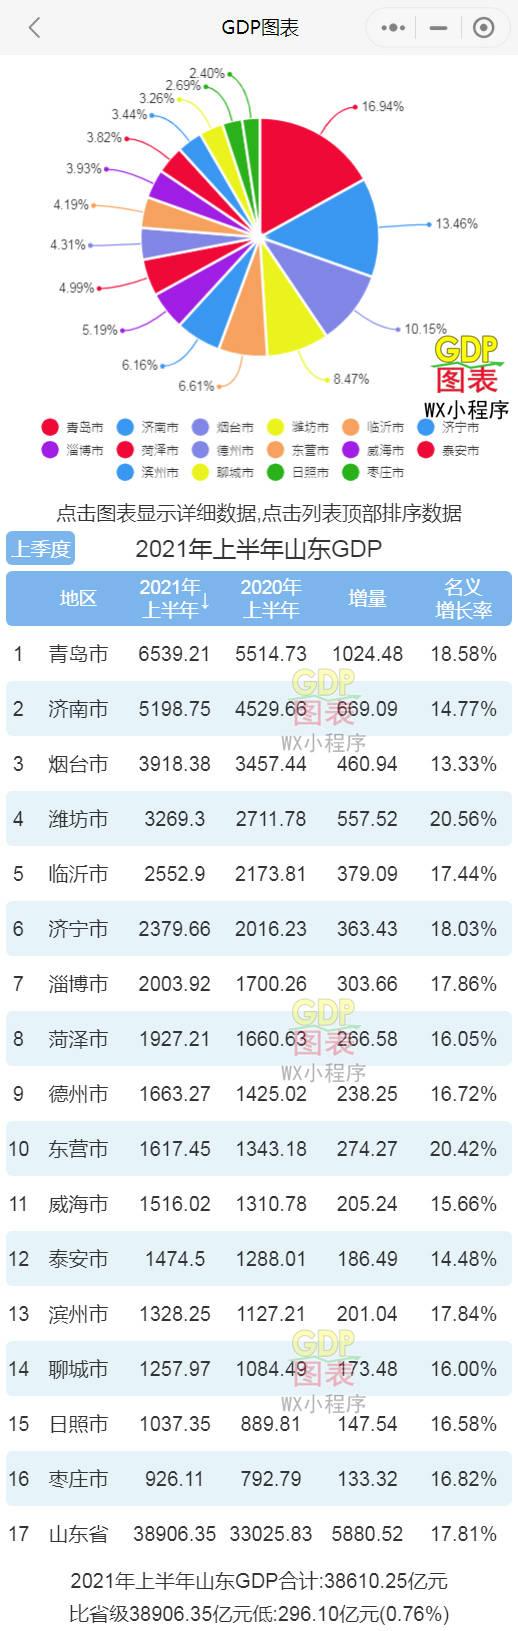 GDP青岛排名_长沙上半年实现GDP不足6400亿,在中国城市排名被无锡、青岛反超